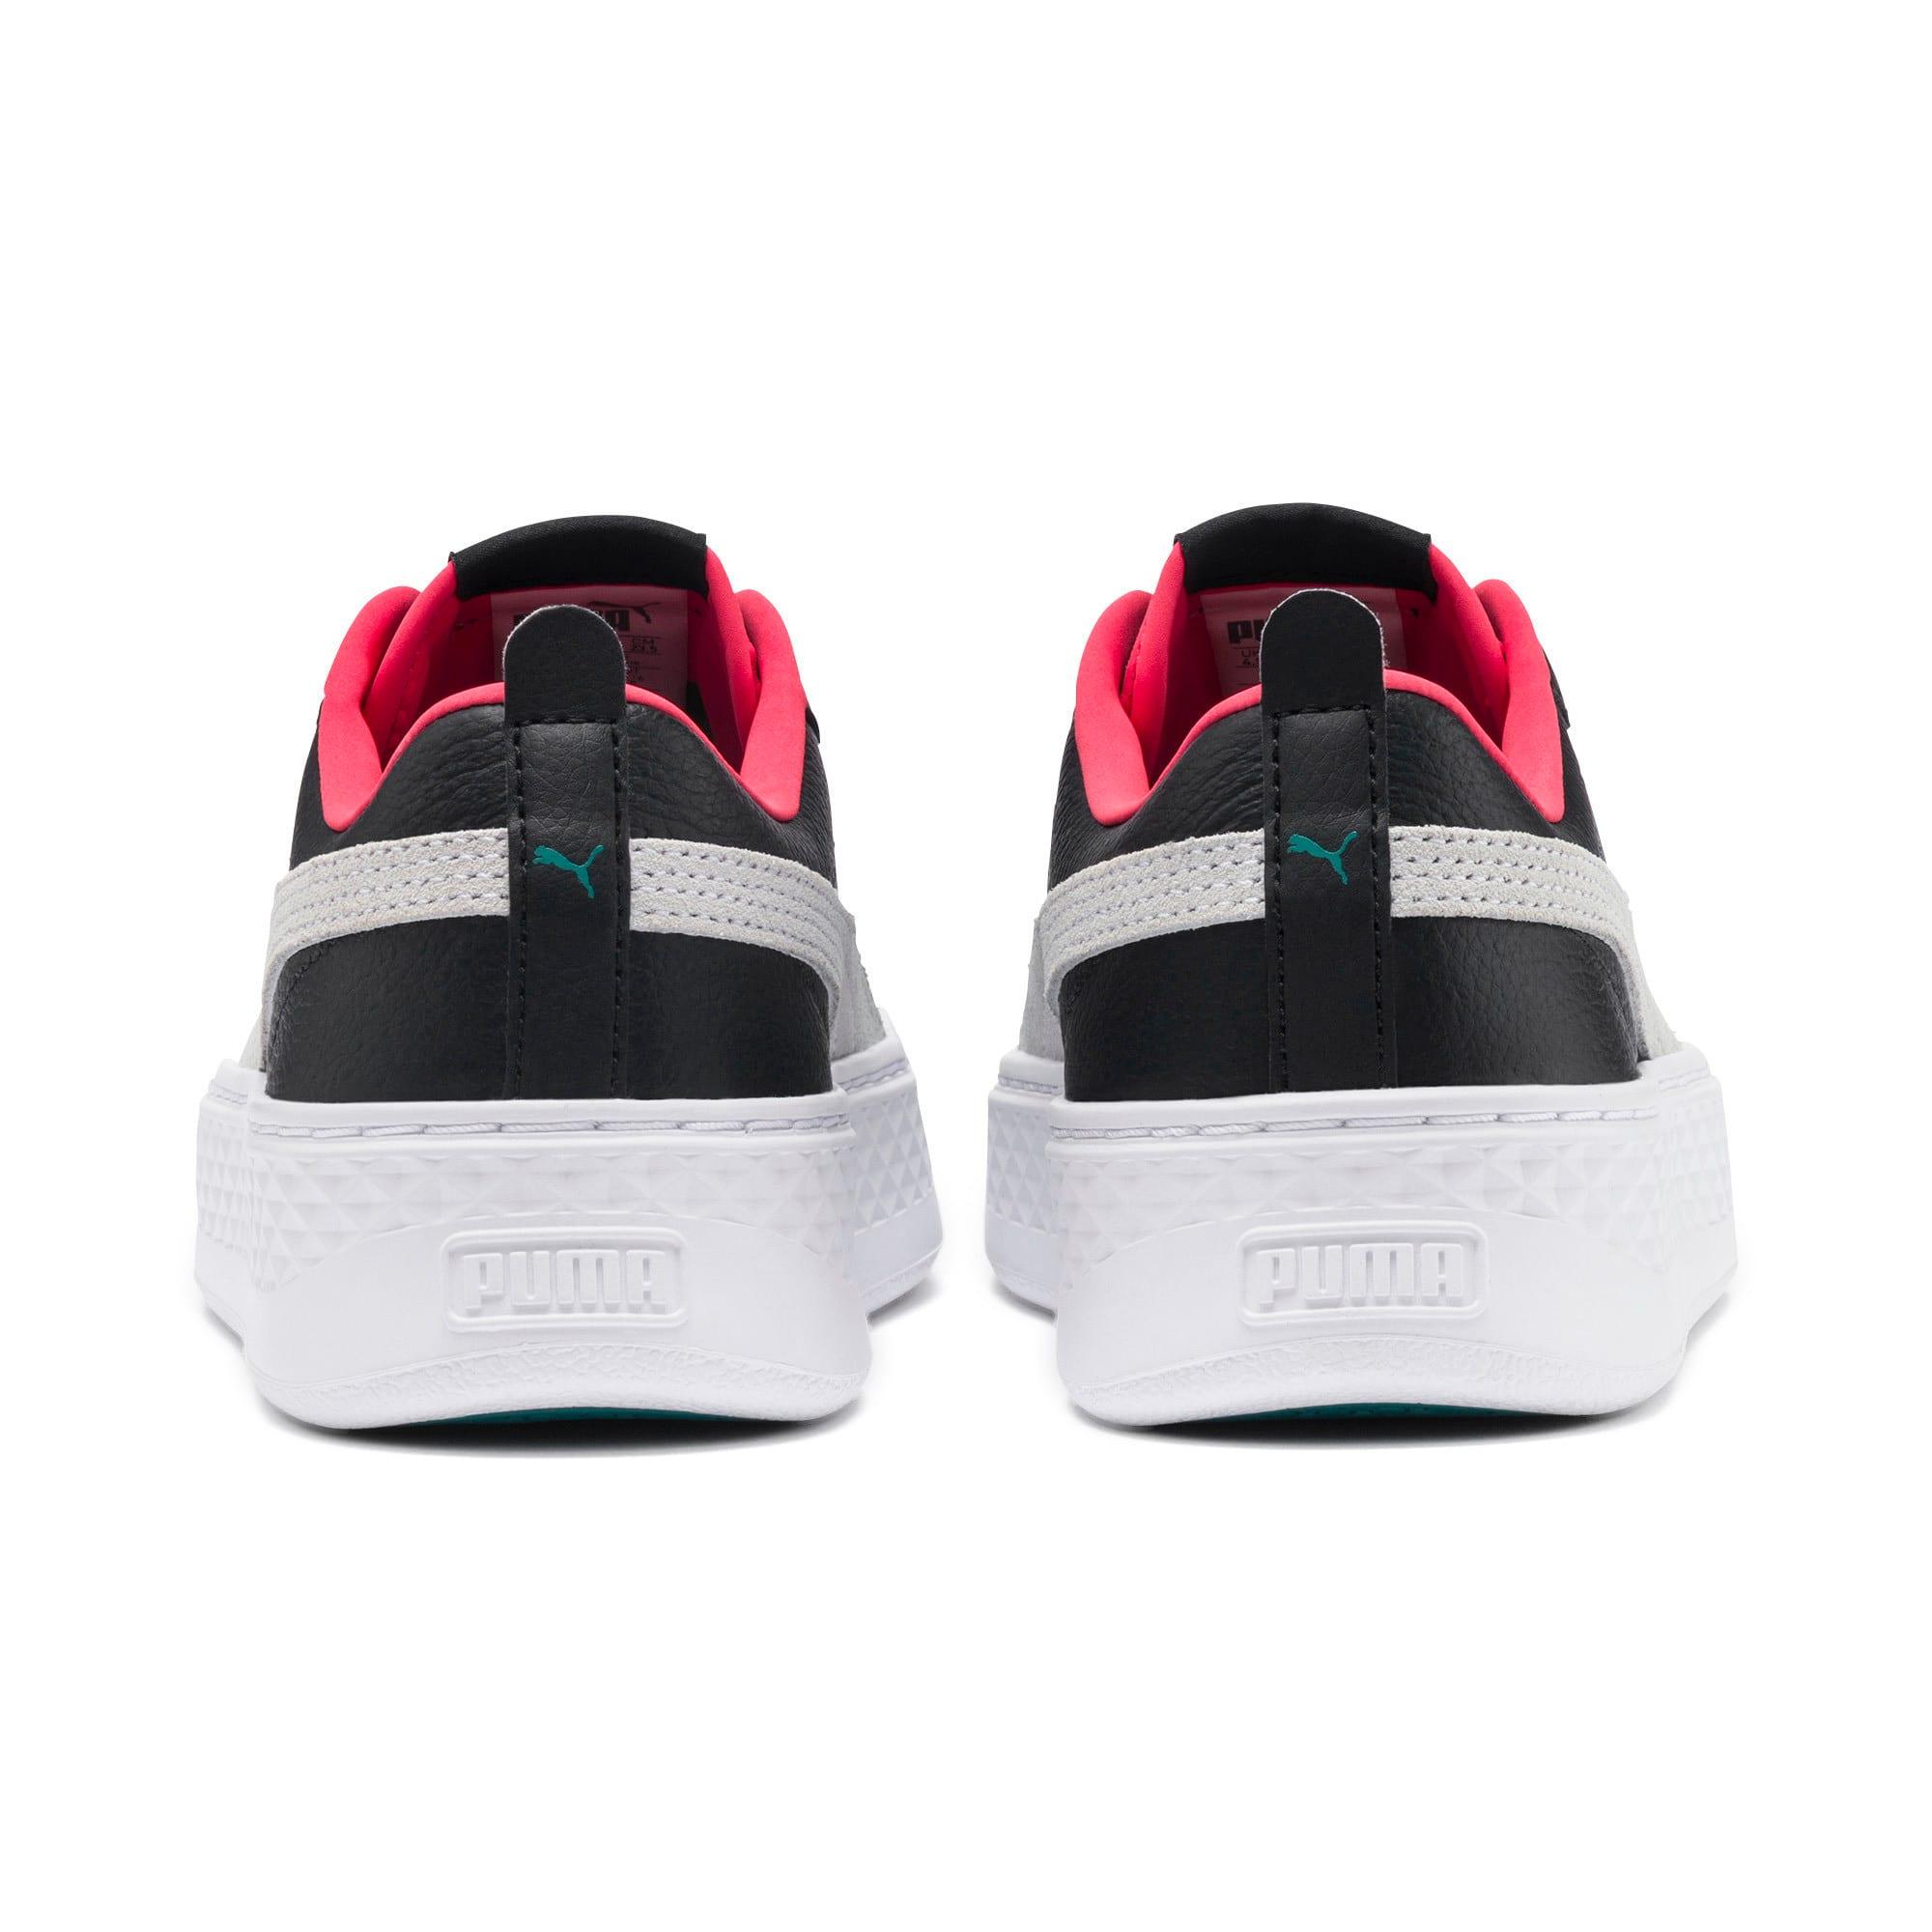 Thumbnail 5 of Puma Smash Platform Women's Shoes, Black-White-T Green-C Coral, medium-IND